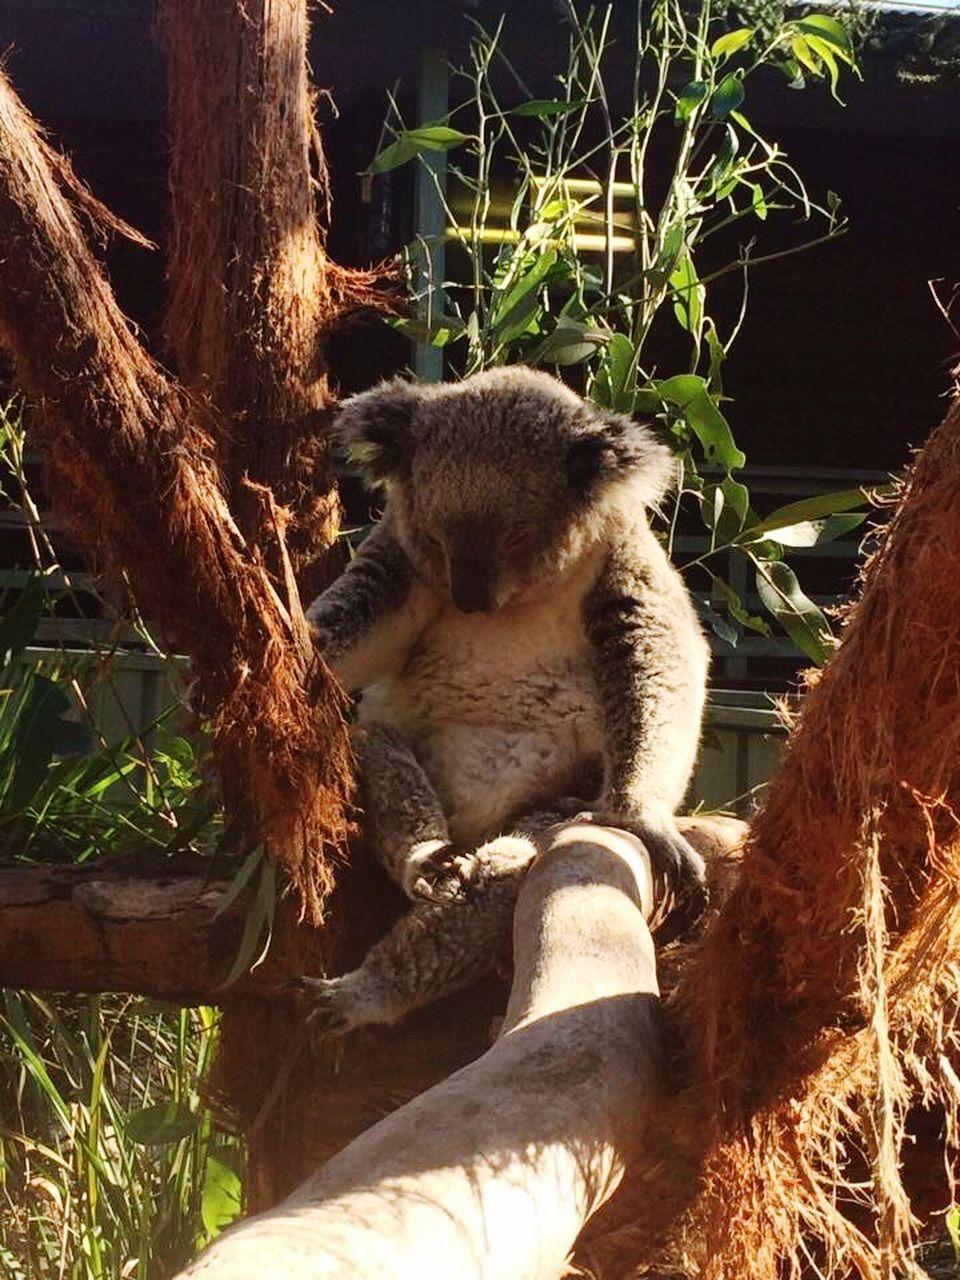 animals in the wild, animal themes, mammal, one animal, animal wildlife, no people, koala, outdoors, sitting, day, sunlight, tree, nature, branch, close-up